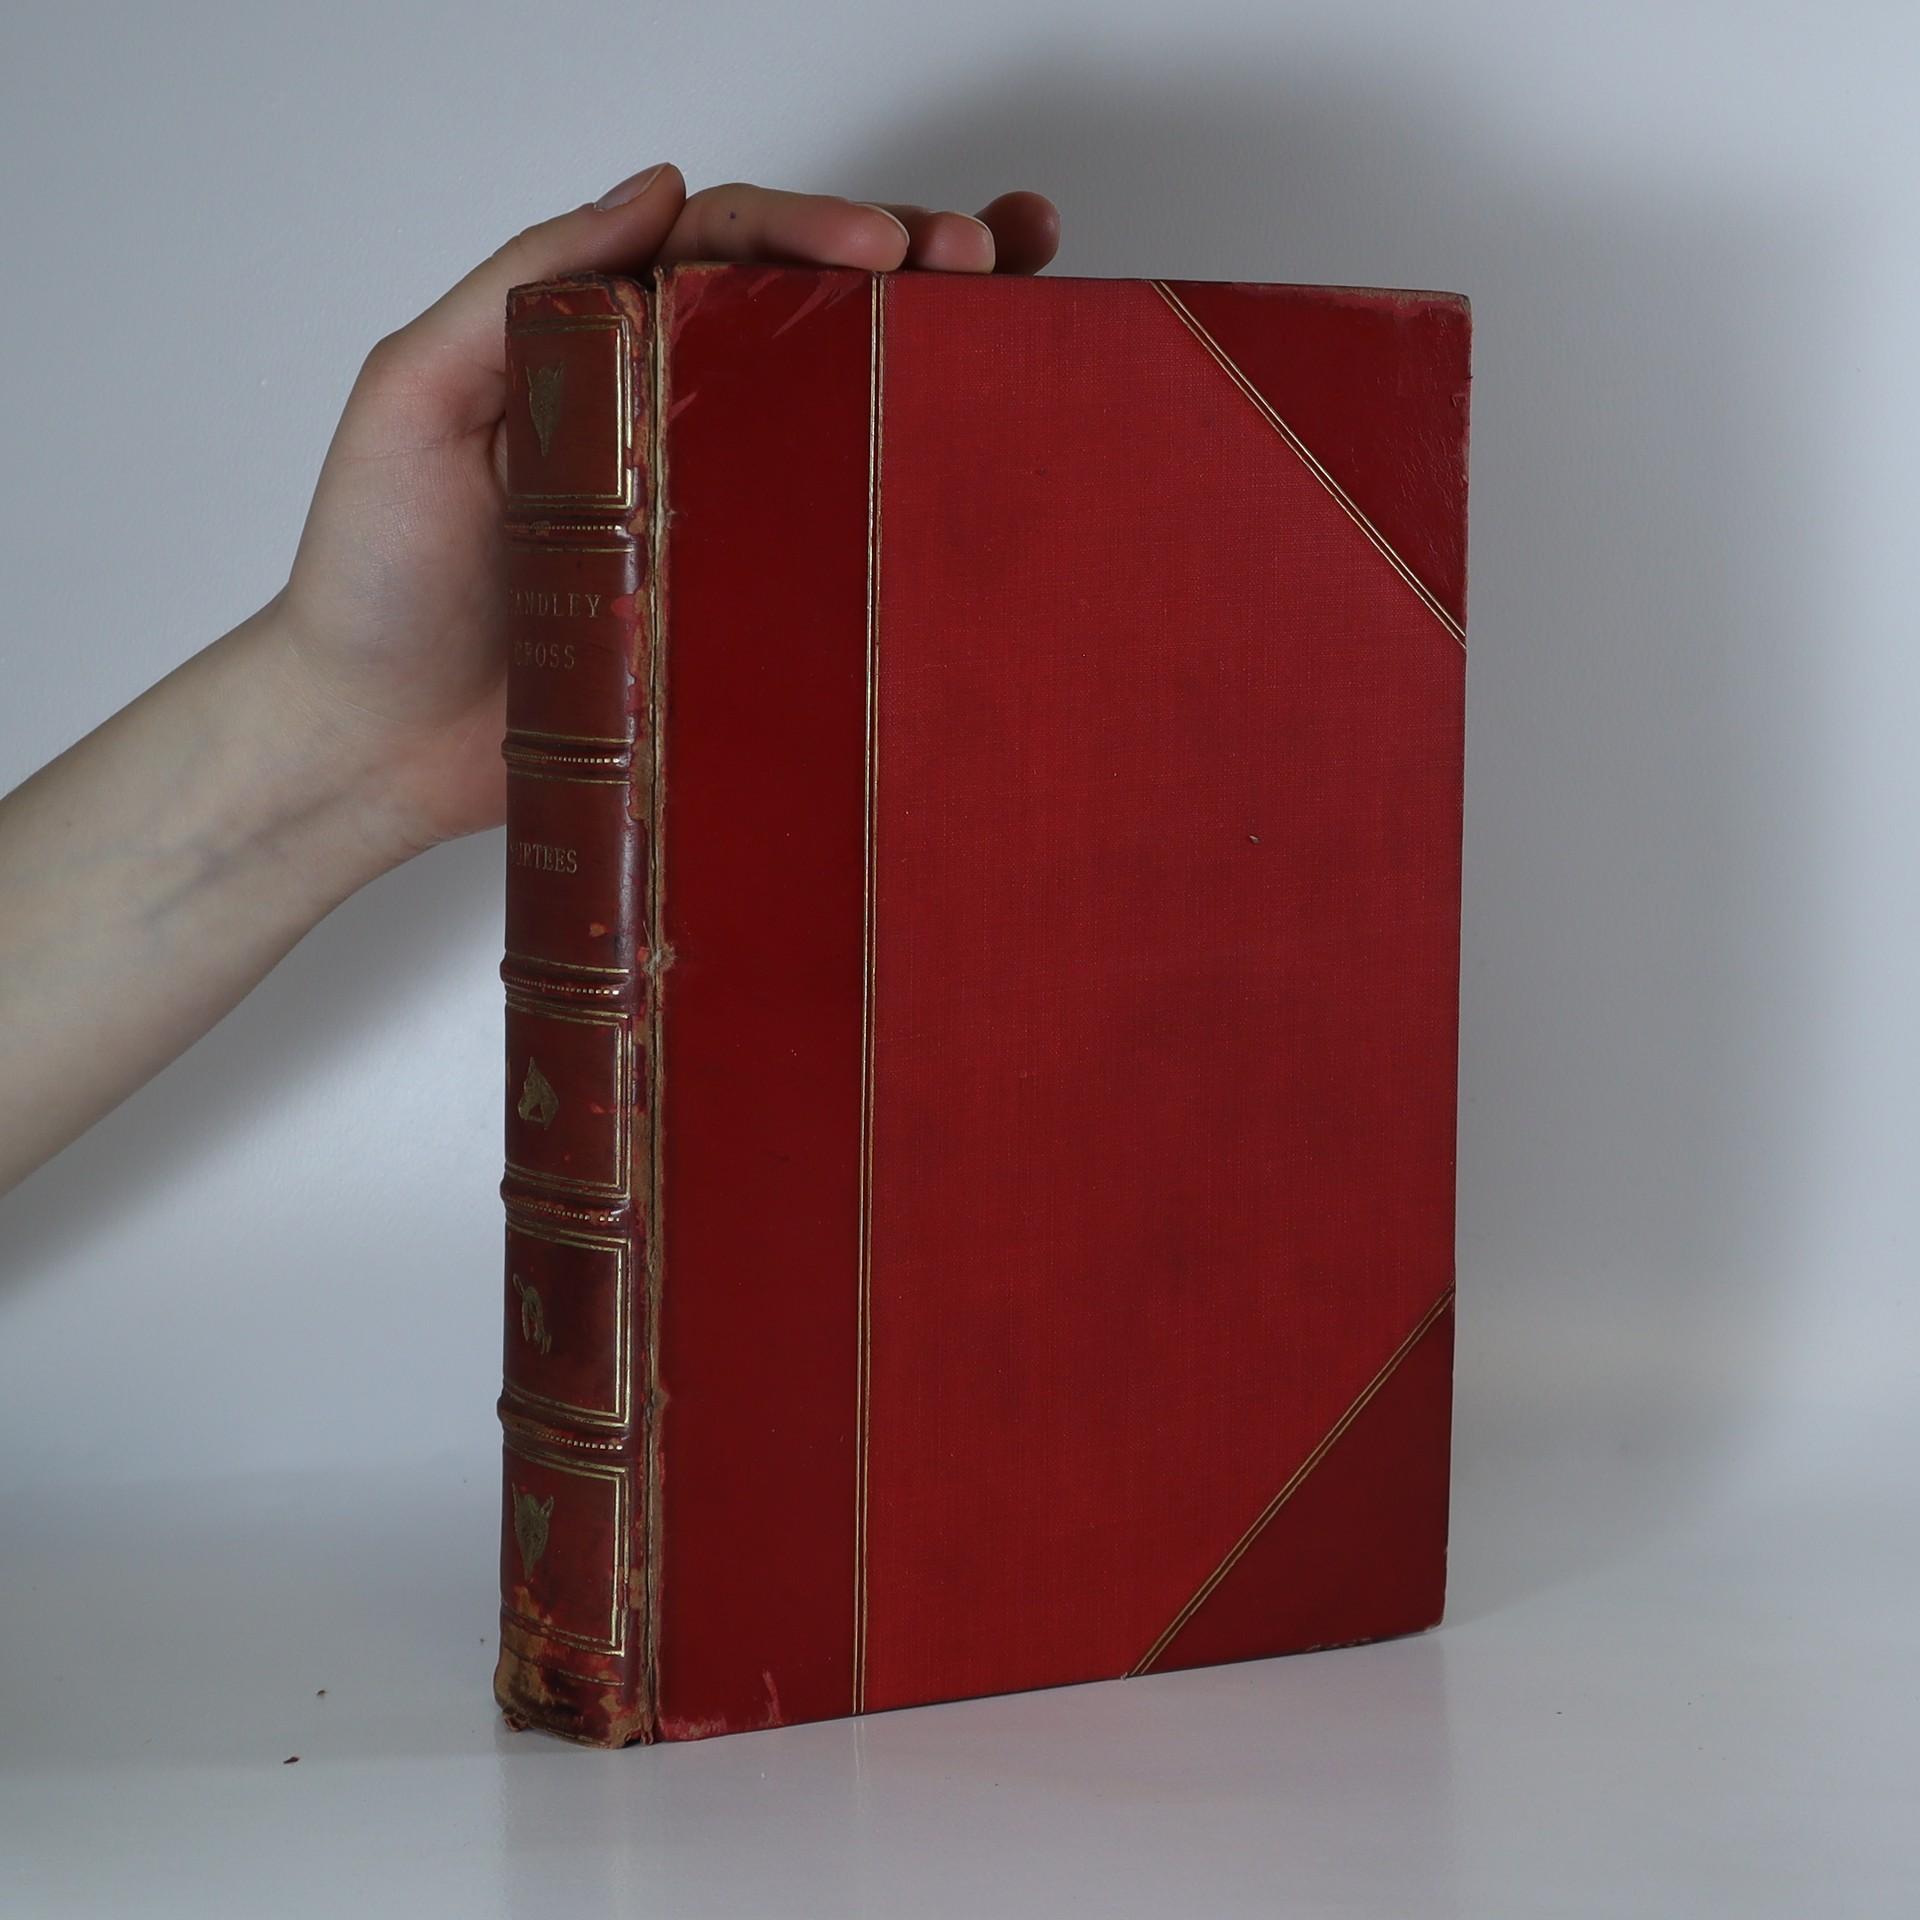 antikvární kniha Handley Cross or Mr. Jorrocks's Hunt, neuveden